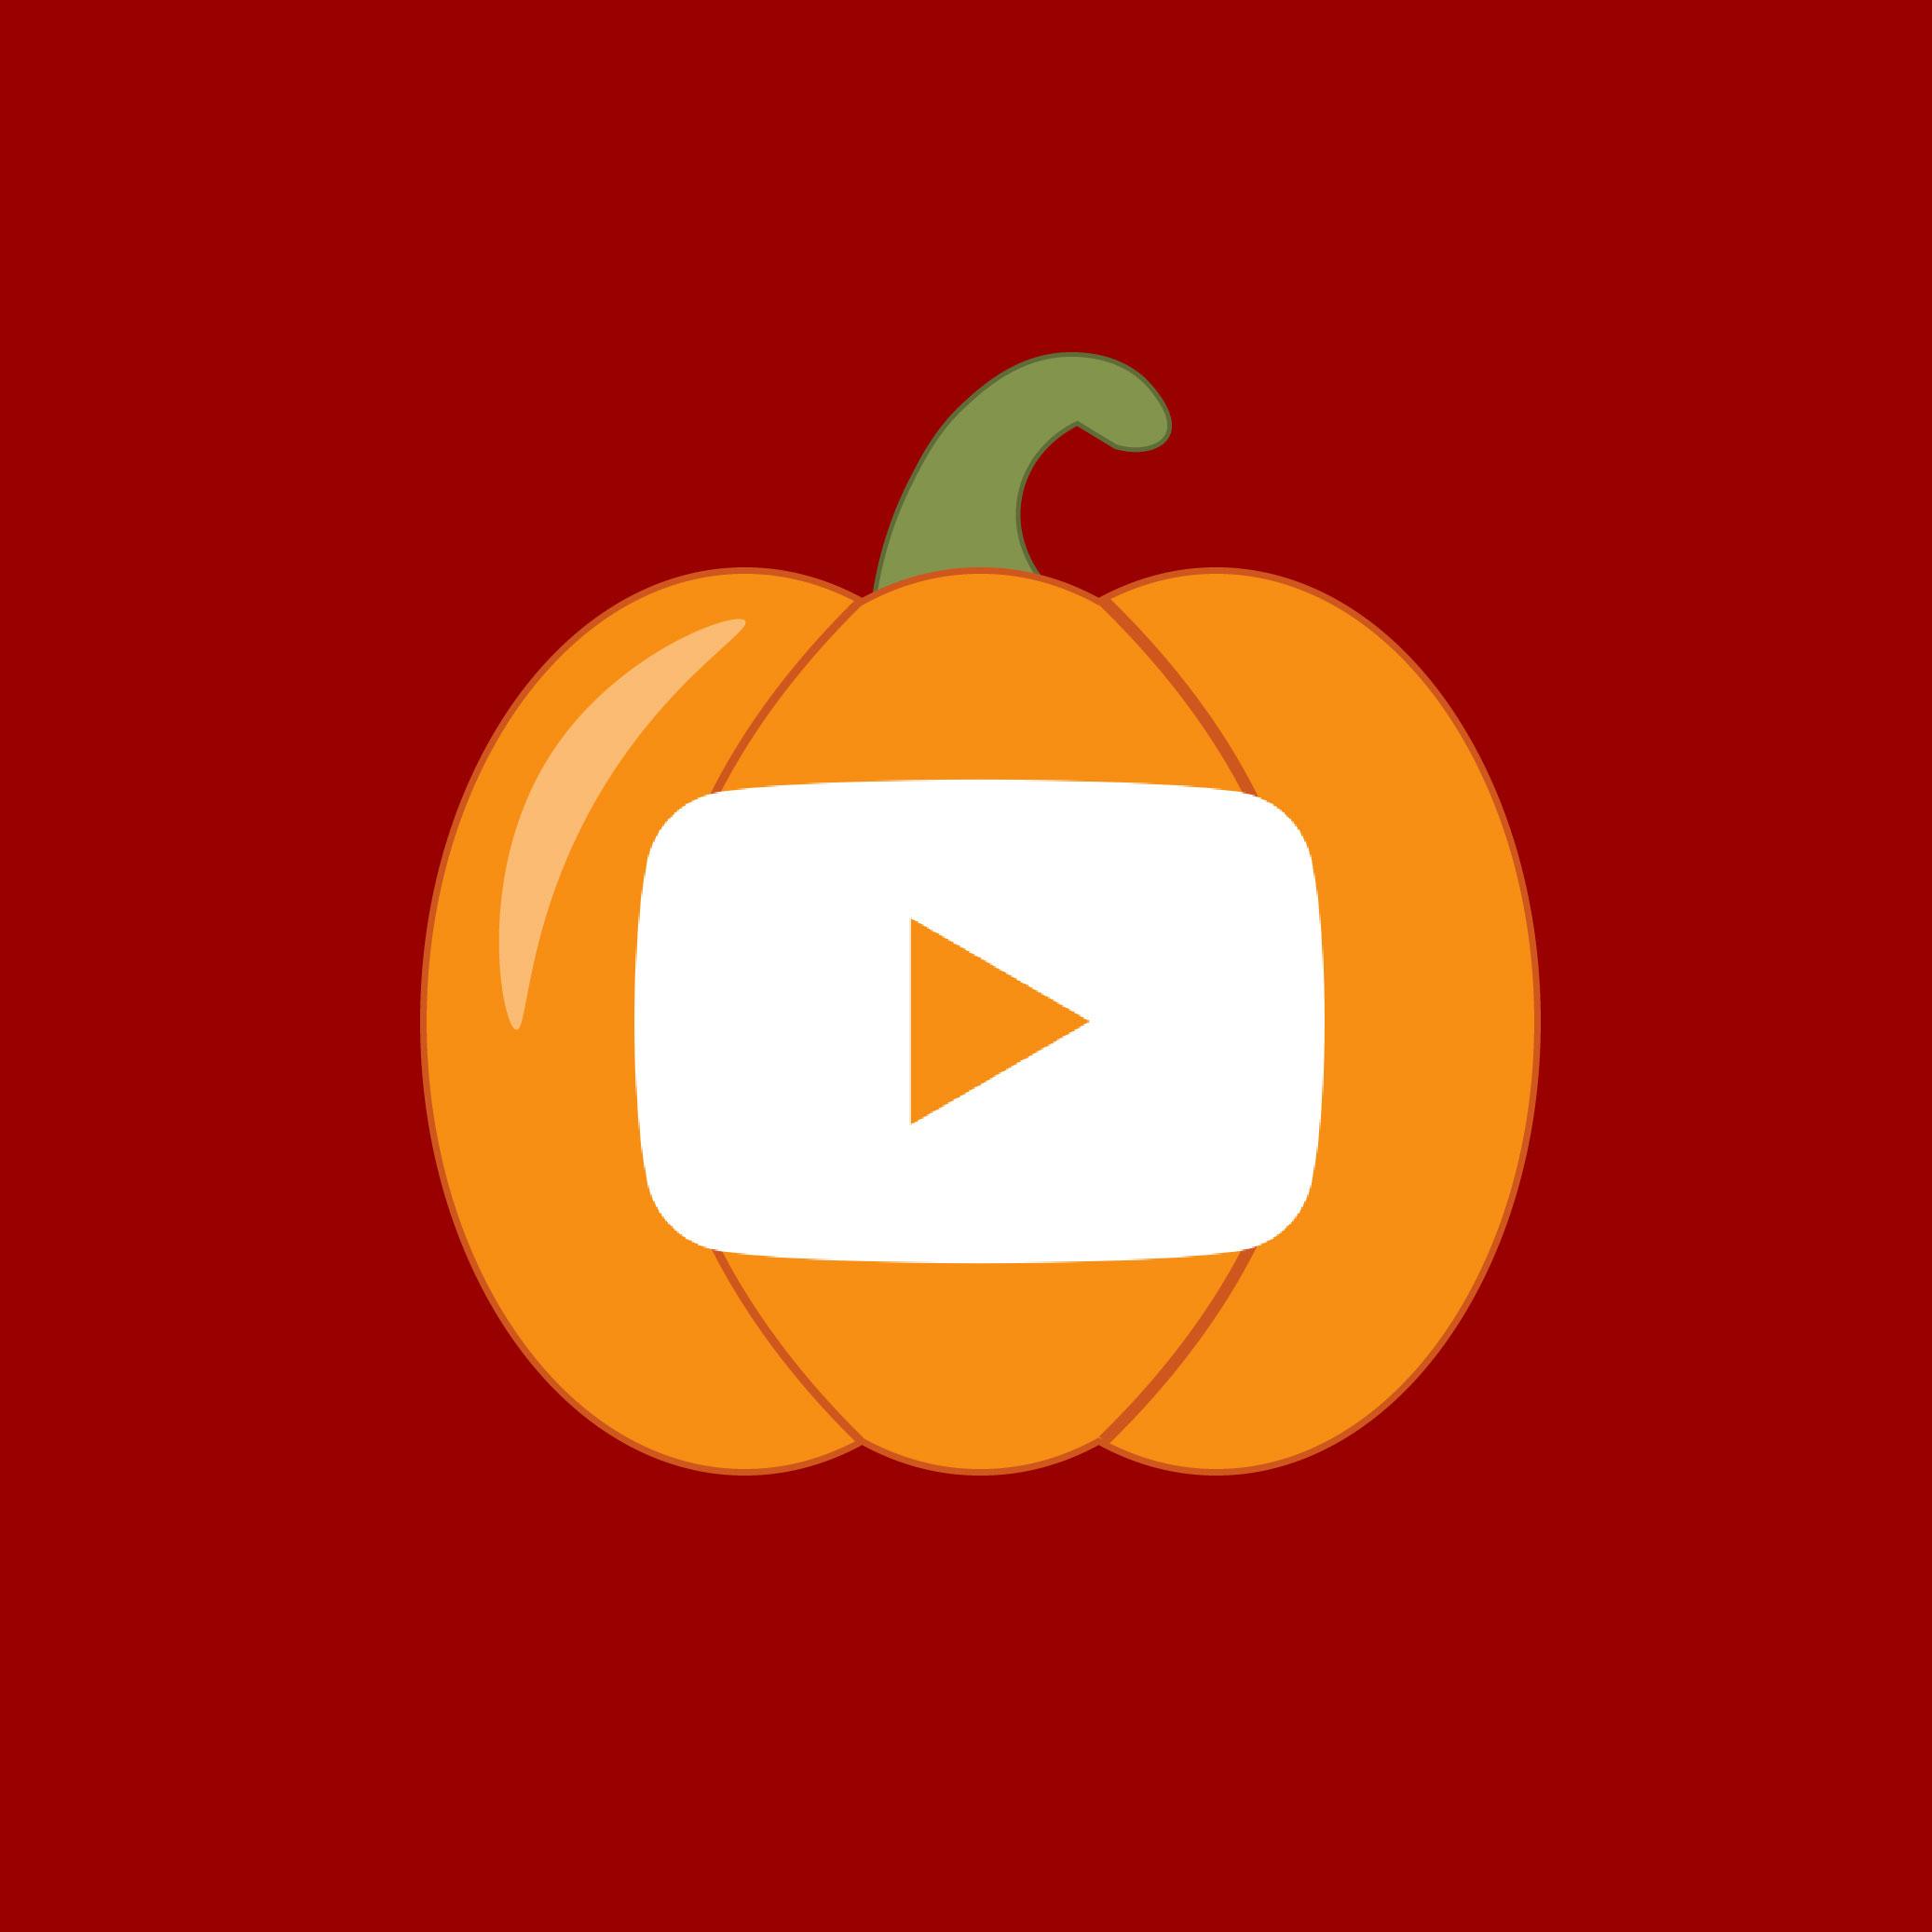 YouTube Halloween App Icon from HalloweenCostumes.com